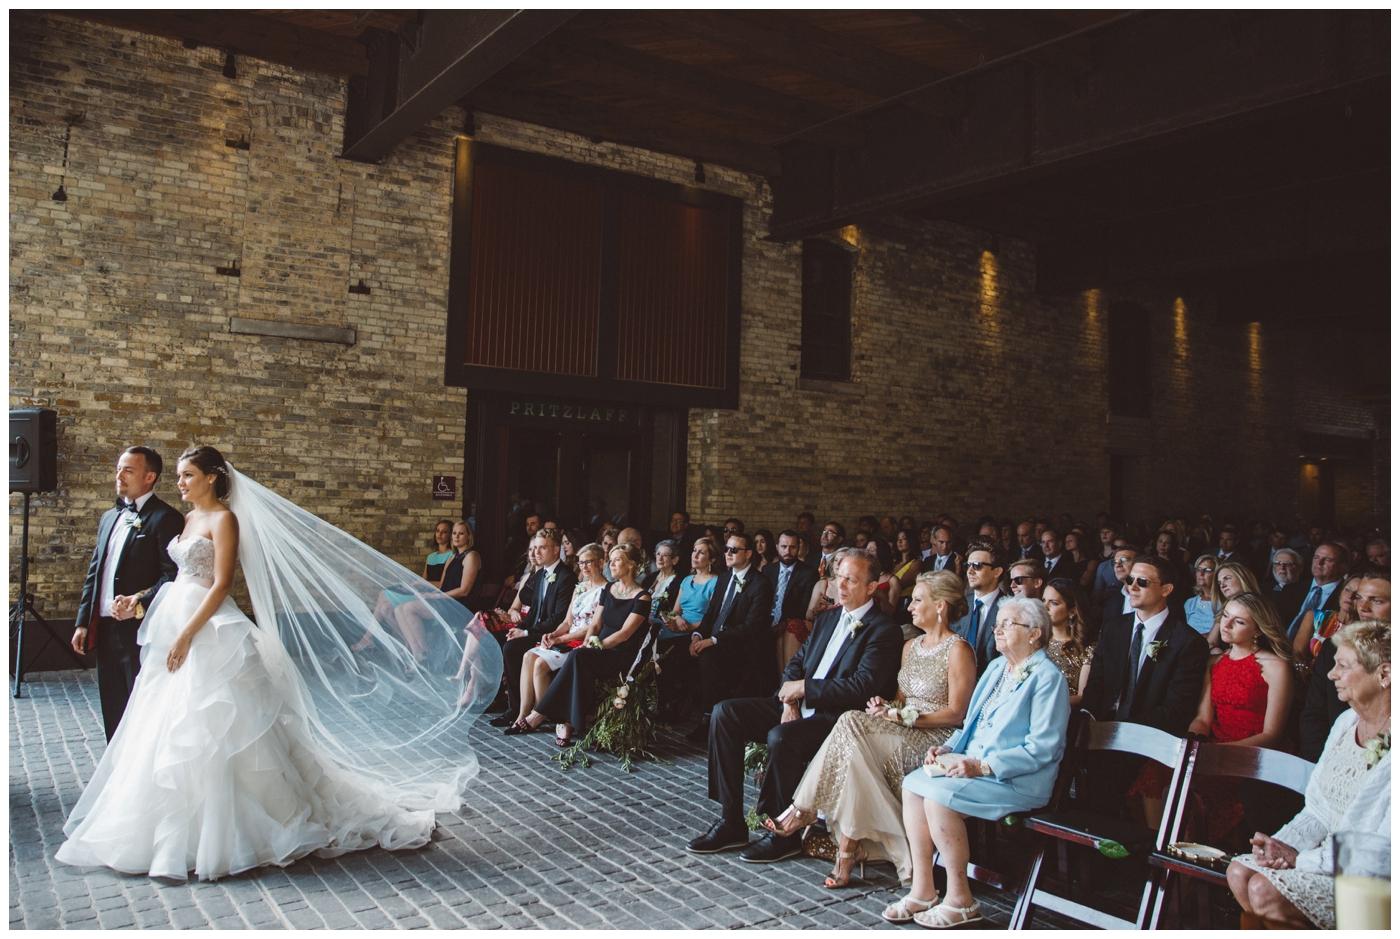 indianapolis_wedding_photographer-27.jpg